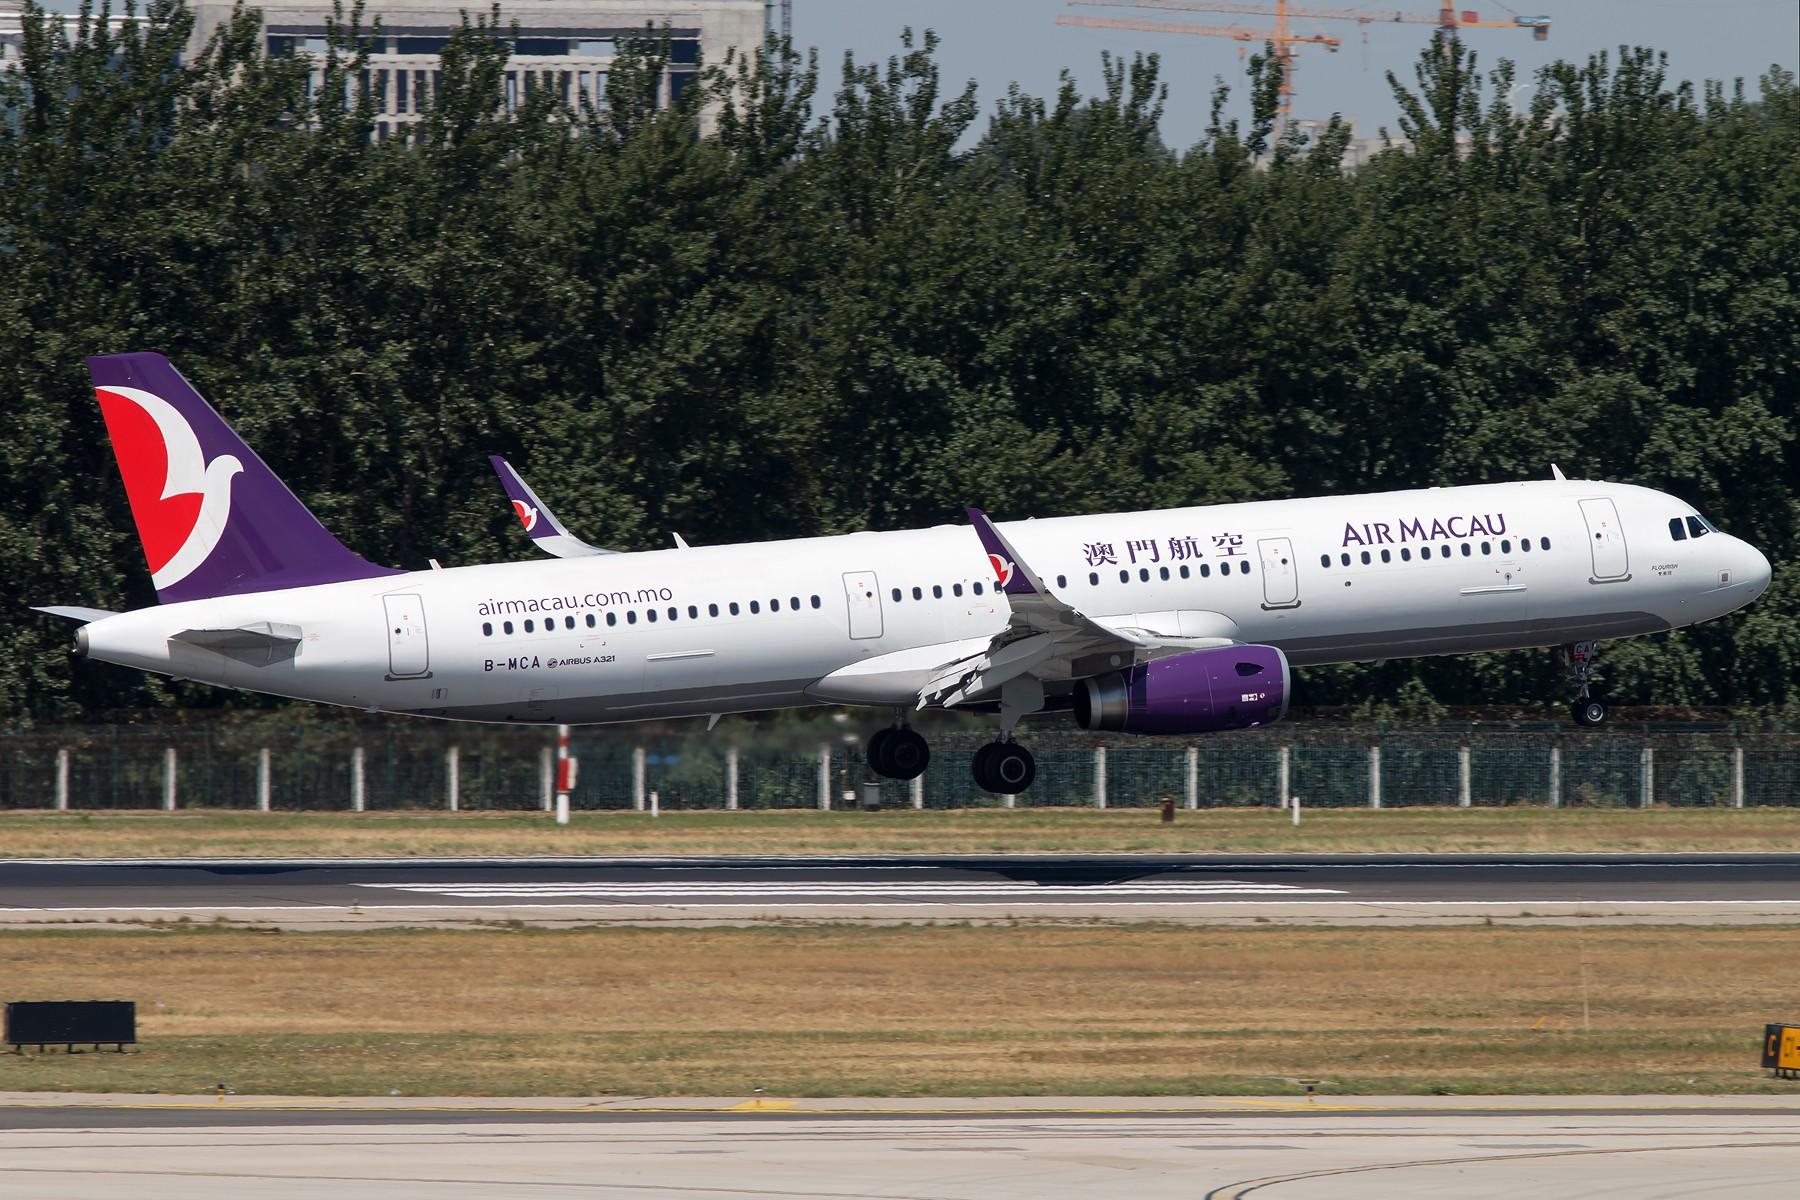 Re:[原创]周末晨练10张 1800*1200 AIRBUS A321-200 B-MCA 中国北京首都国际机场